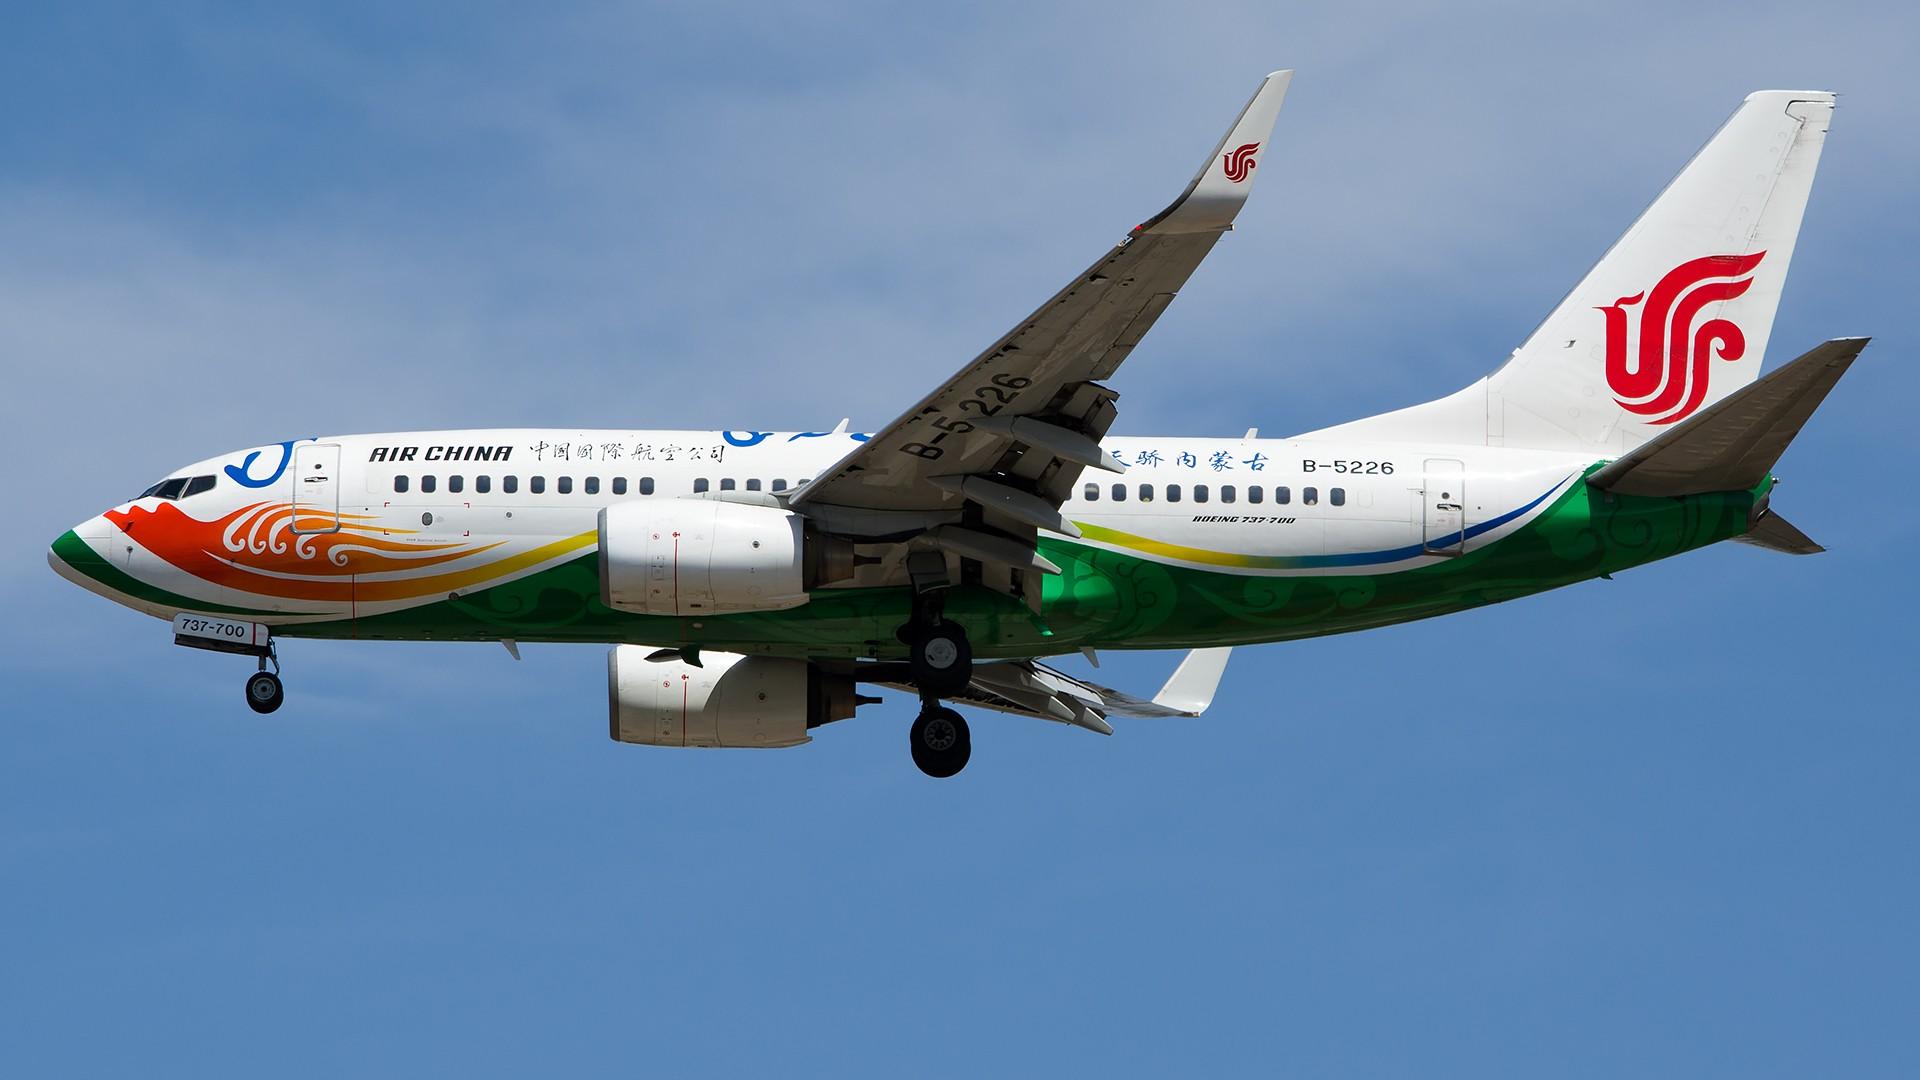 Re:[原创]PEK01午后两小时抓拍,其实是为AA的One World来的 BOEING 737-700 B-5226 中国北京首都国际机场